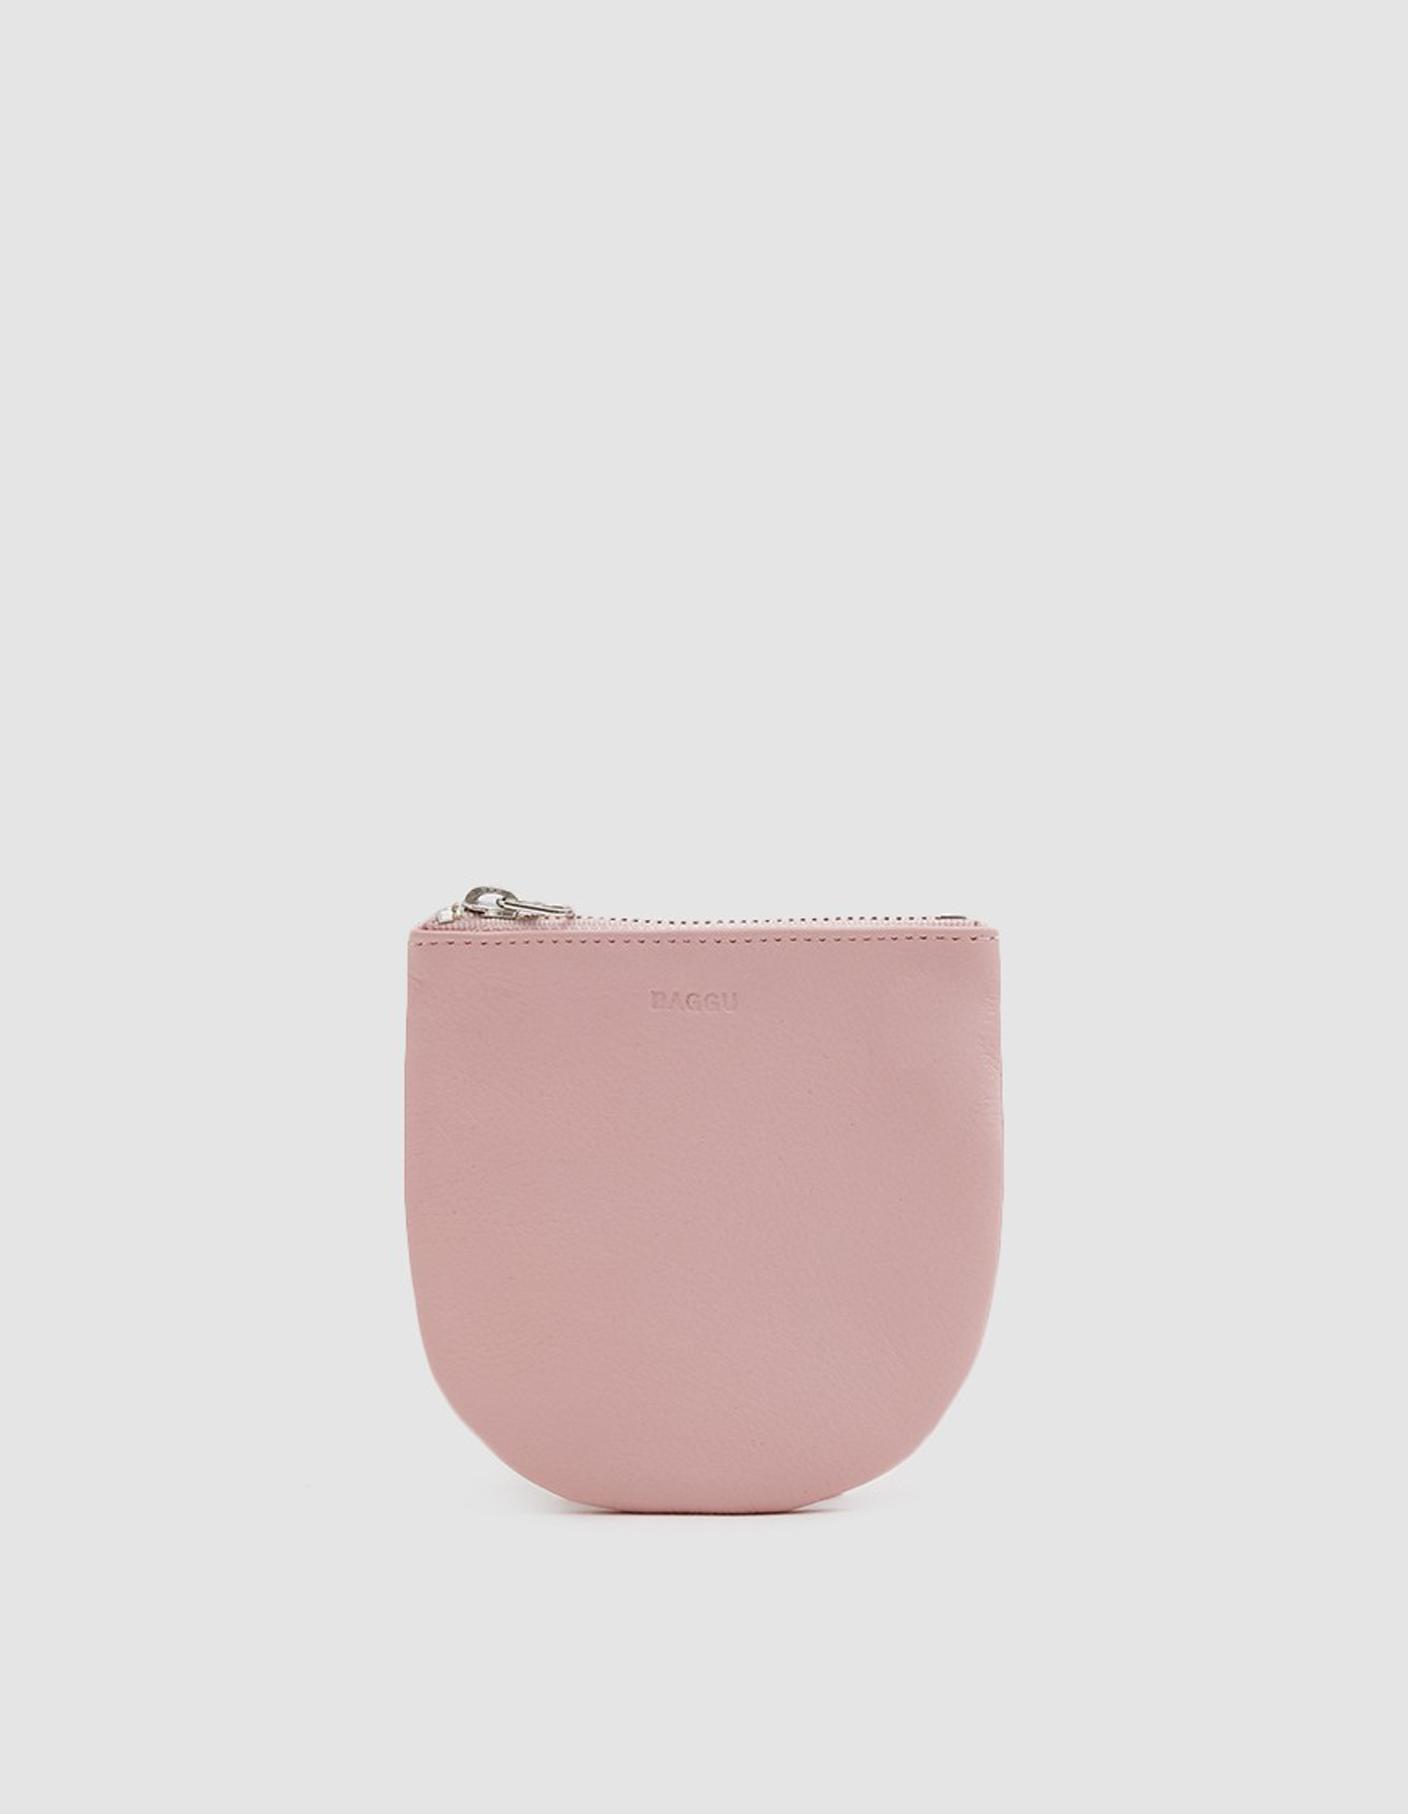 baggu pink pouch